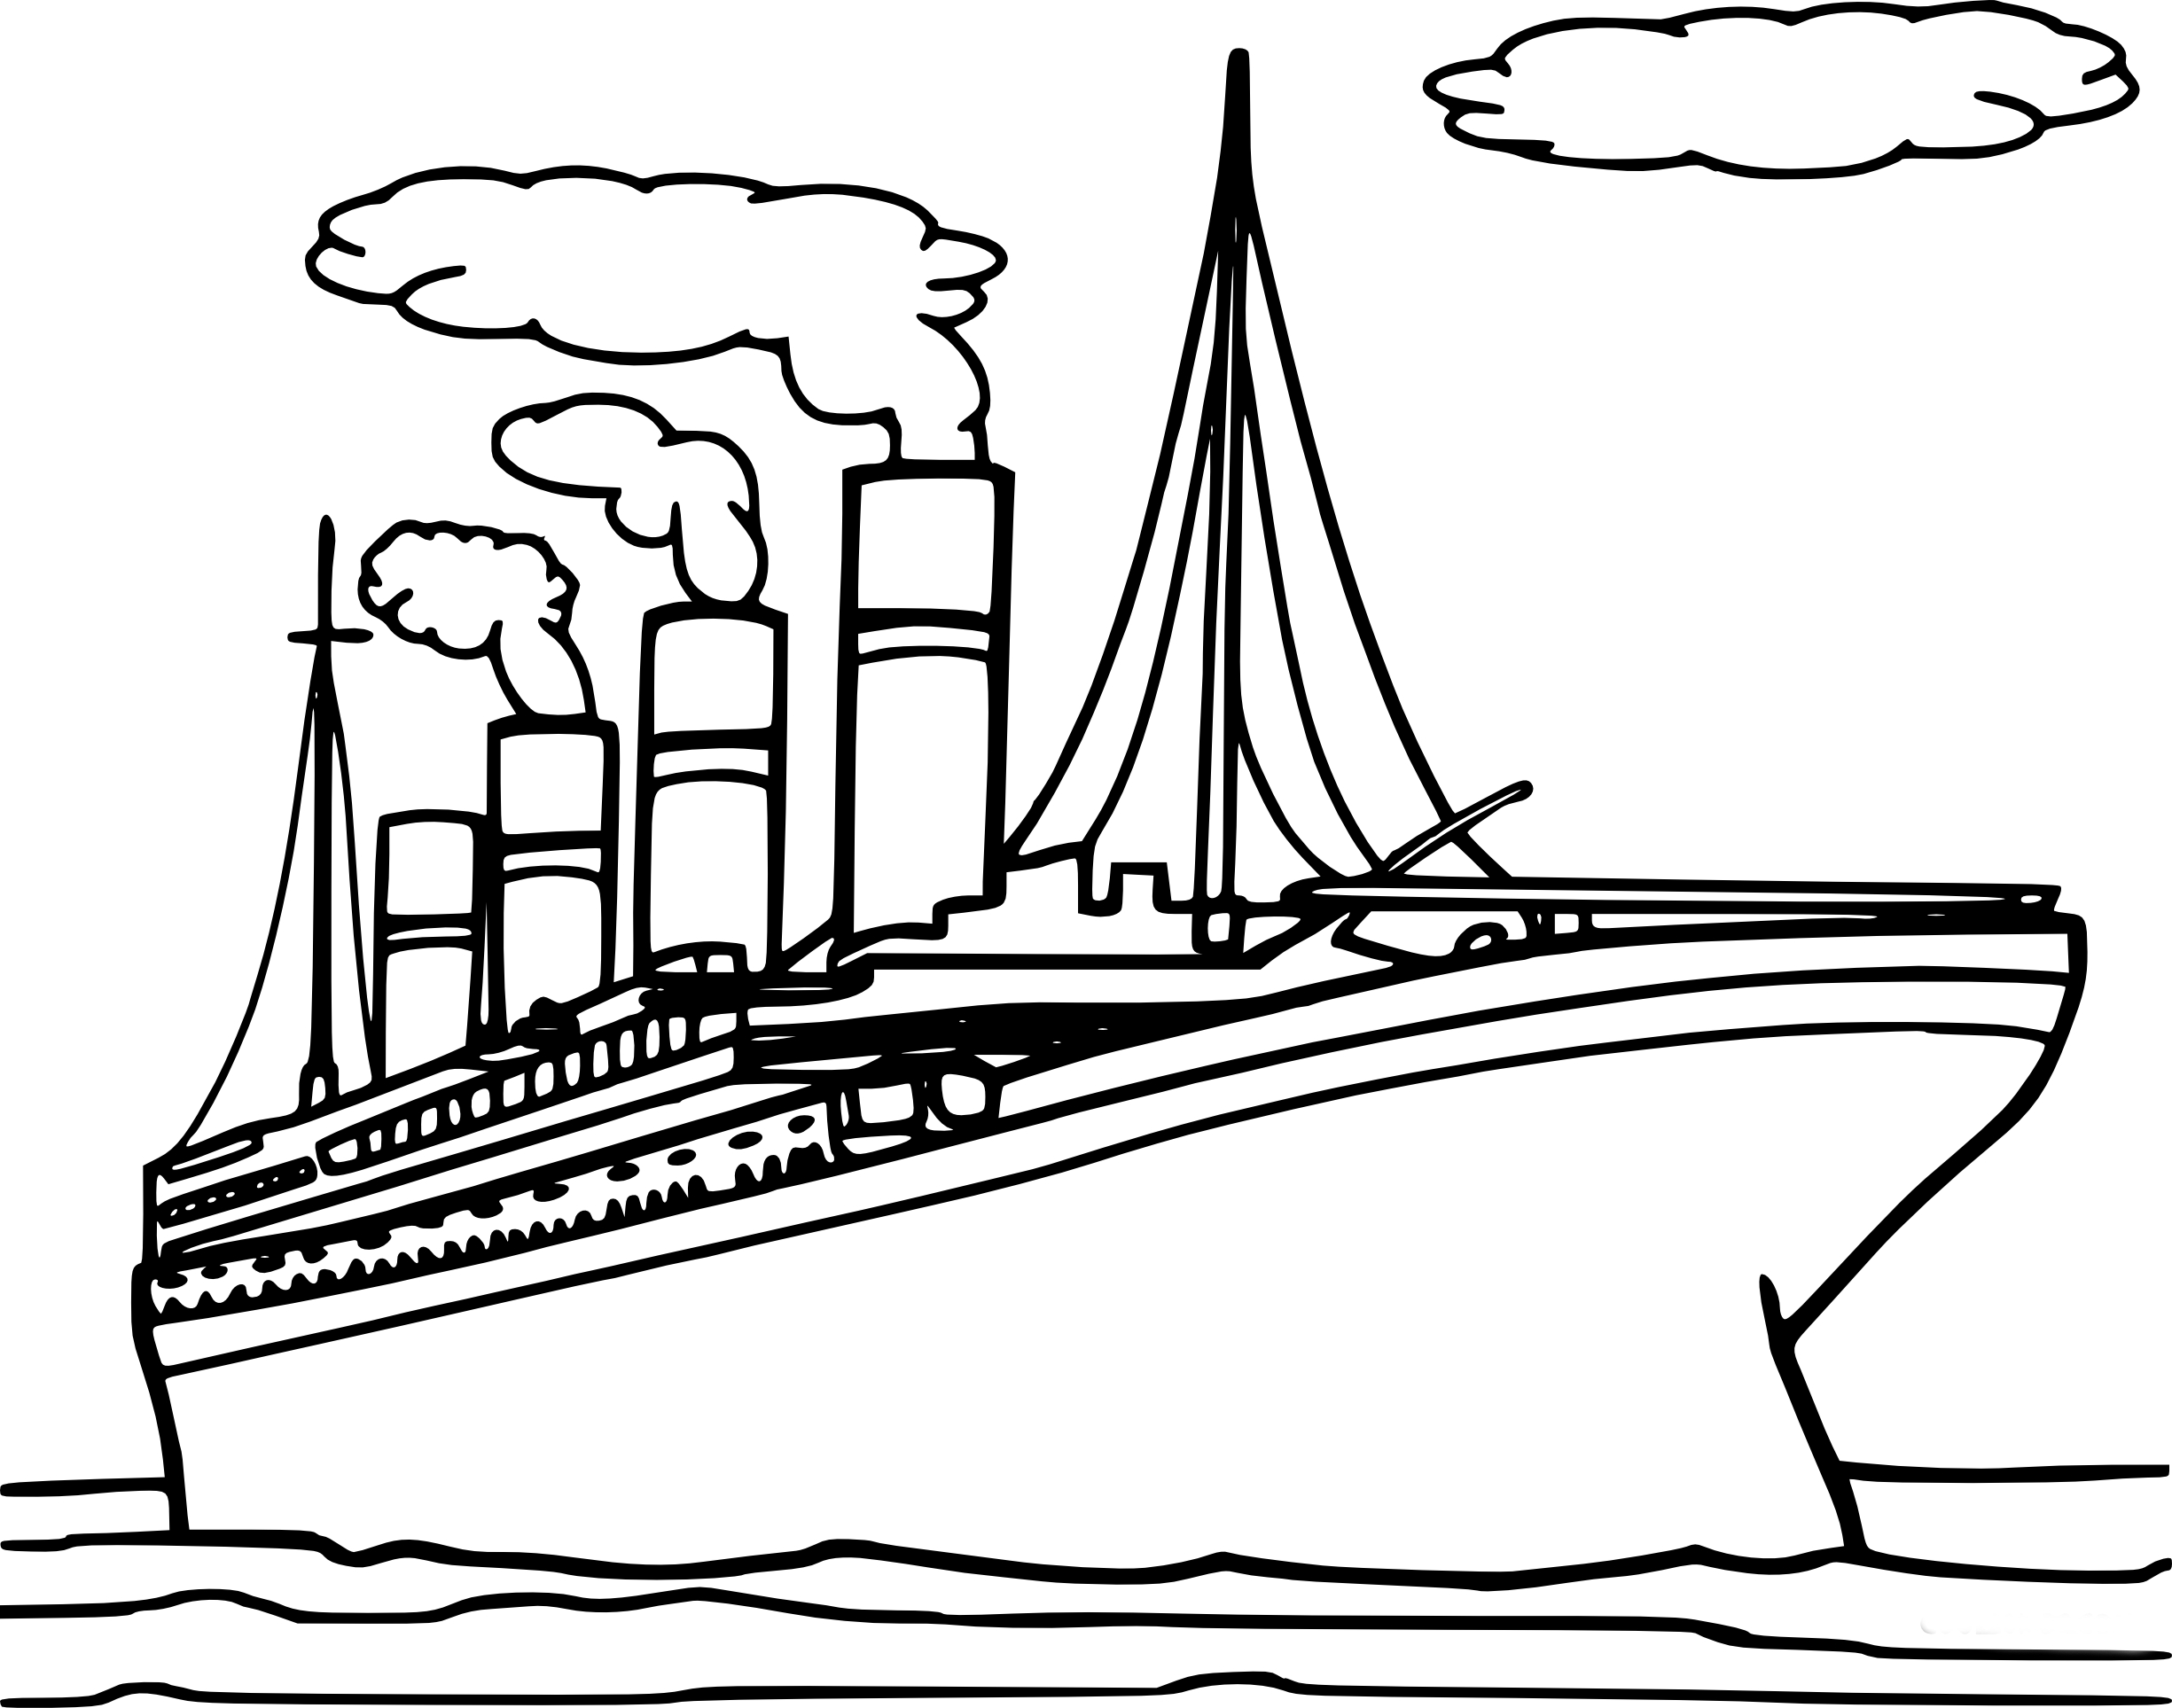 Coloriage titanic à imprimer